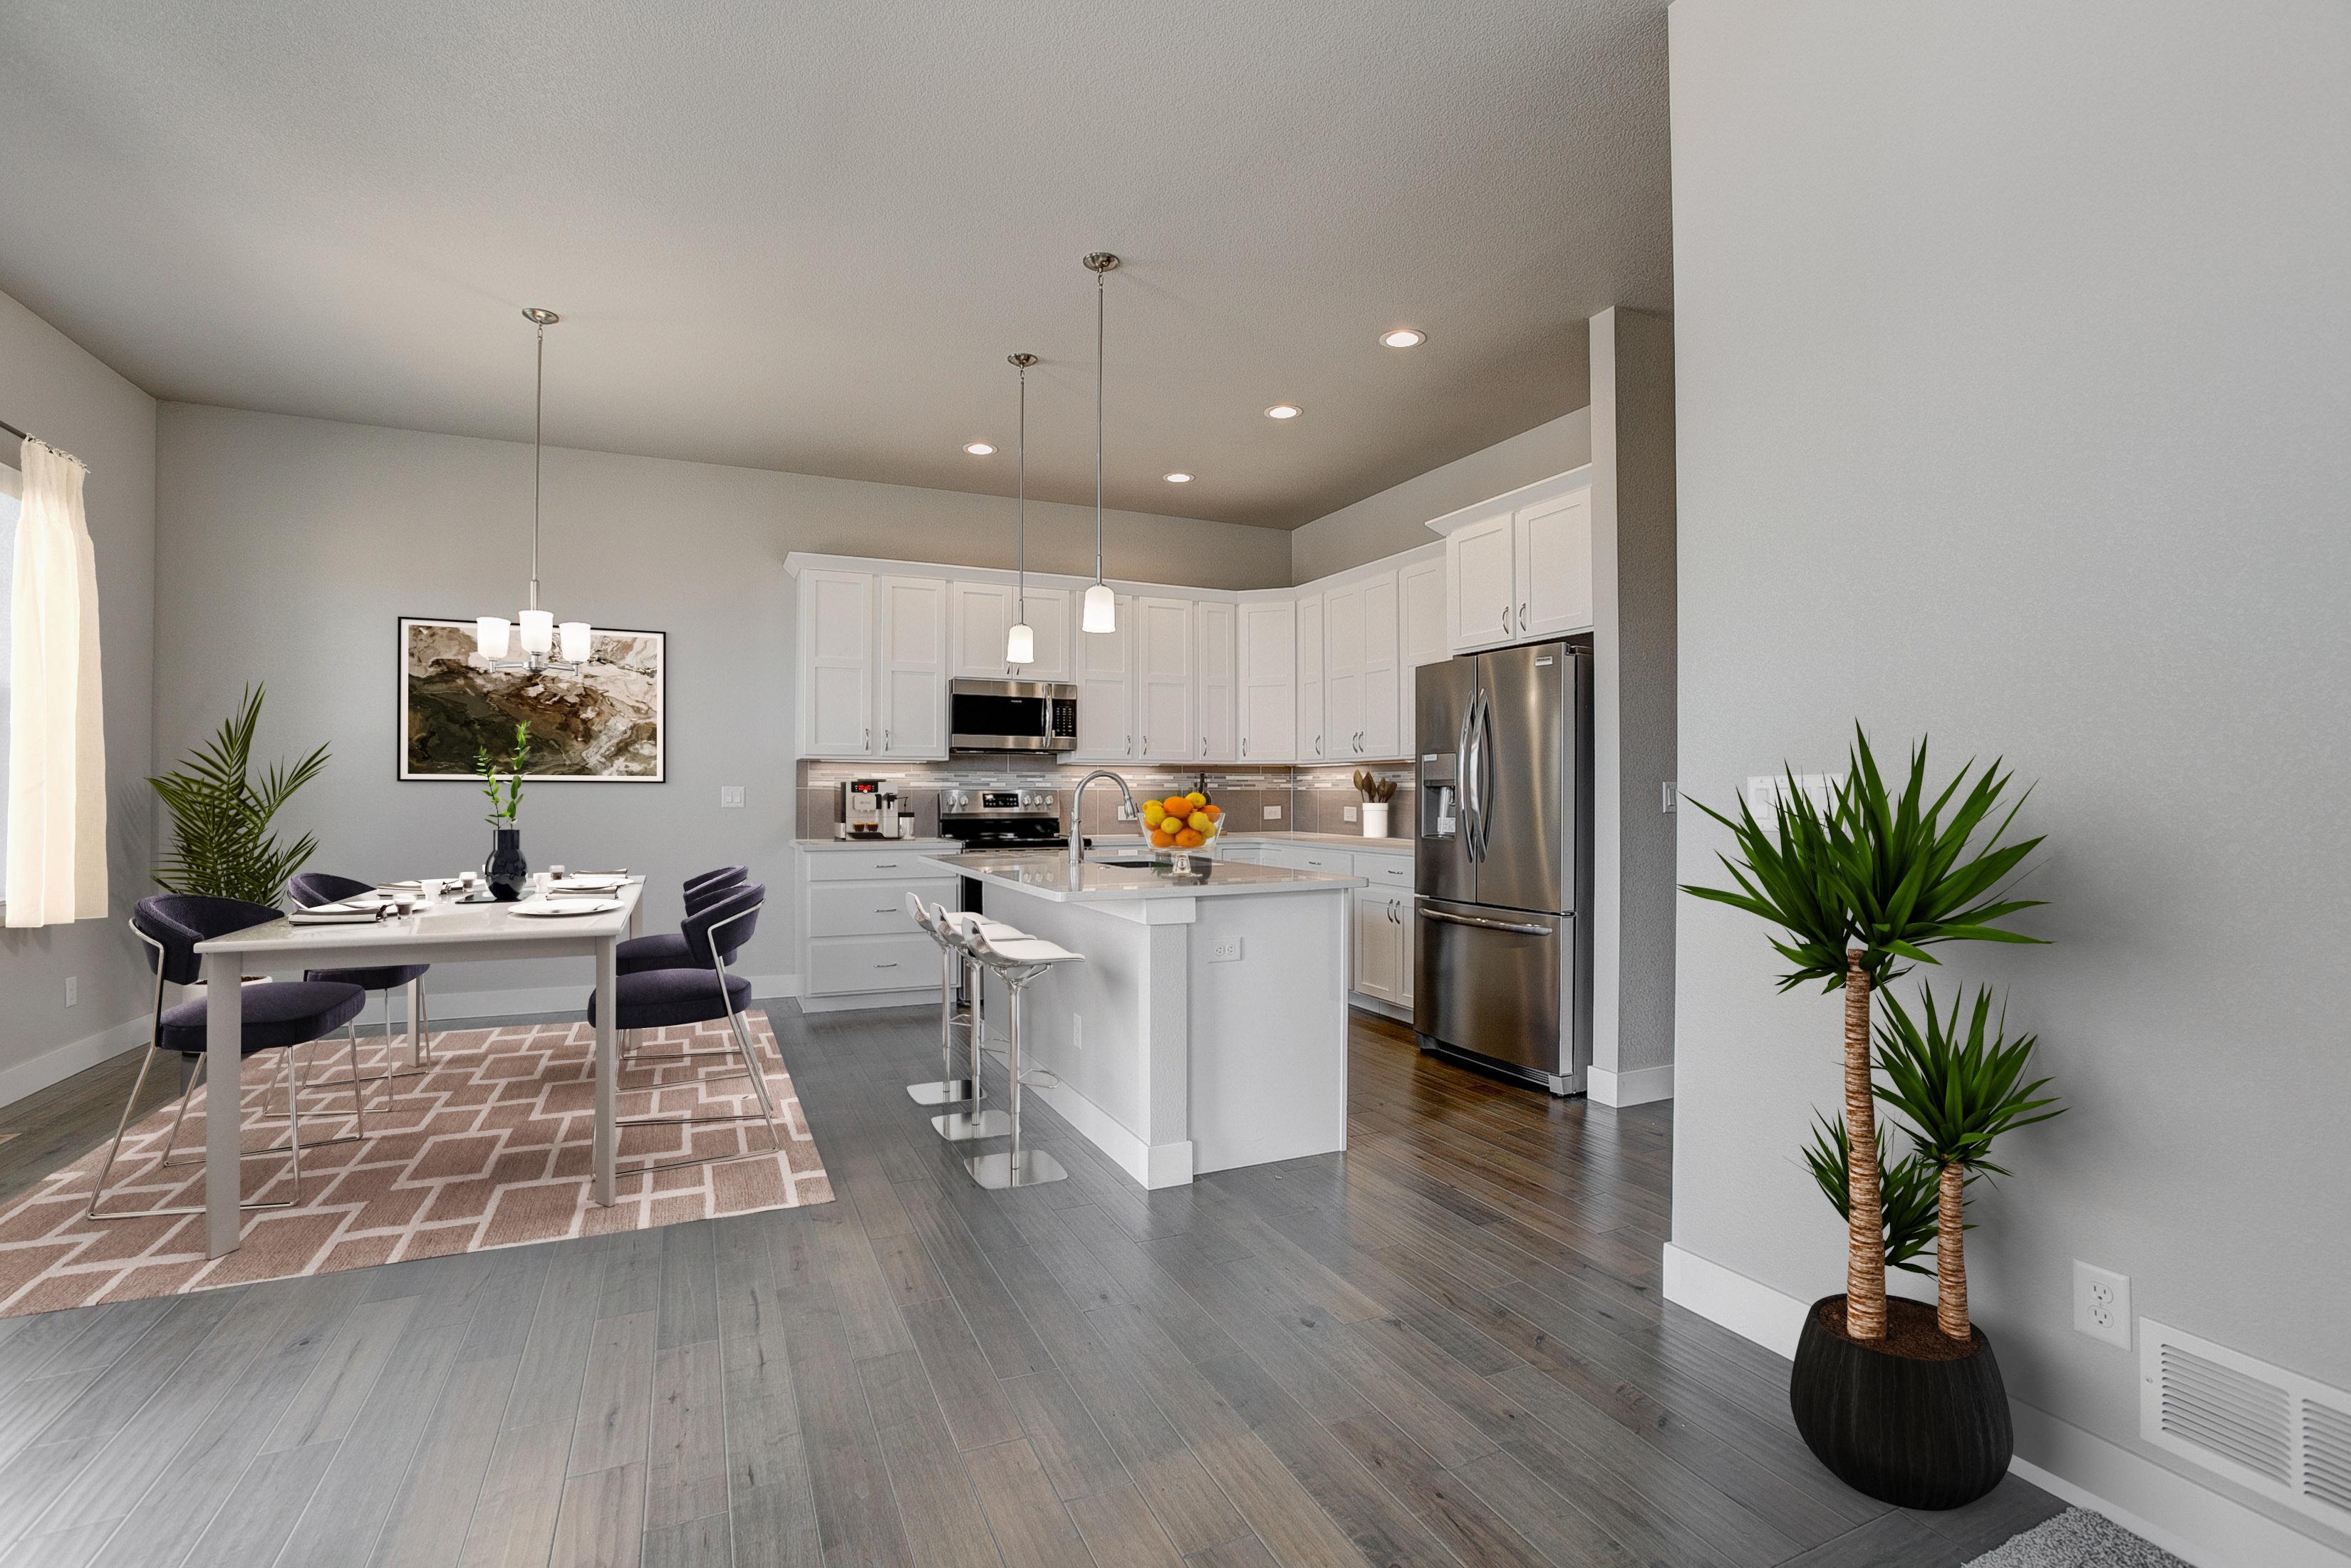 Kitchen featured in the Devon By Landmark Homes  in Fort Collins-Loveland, CO